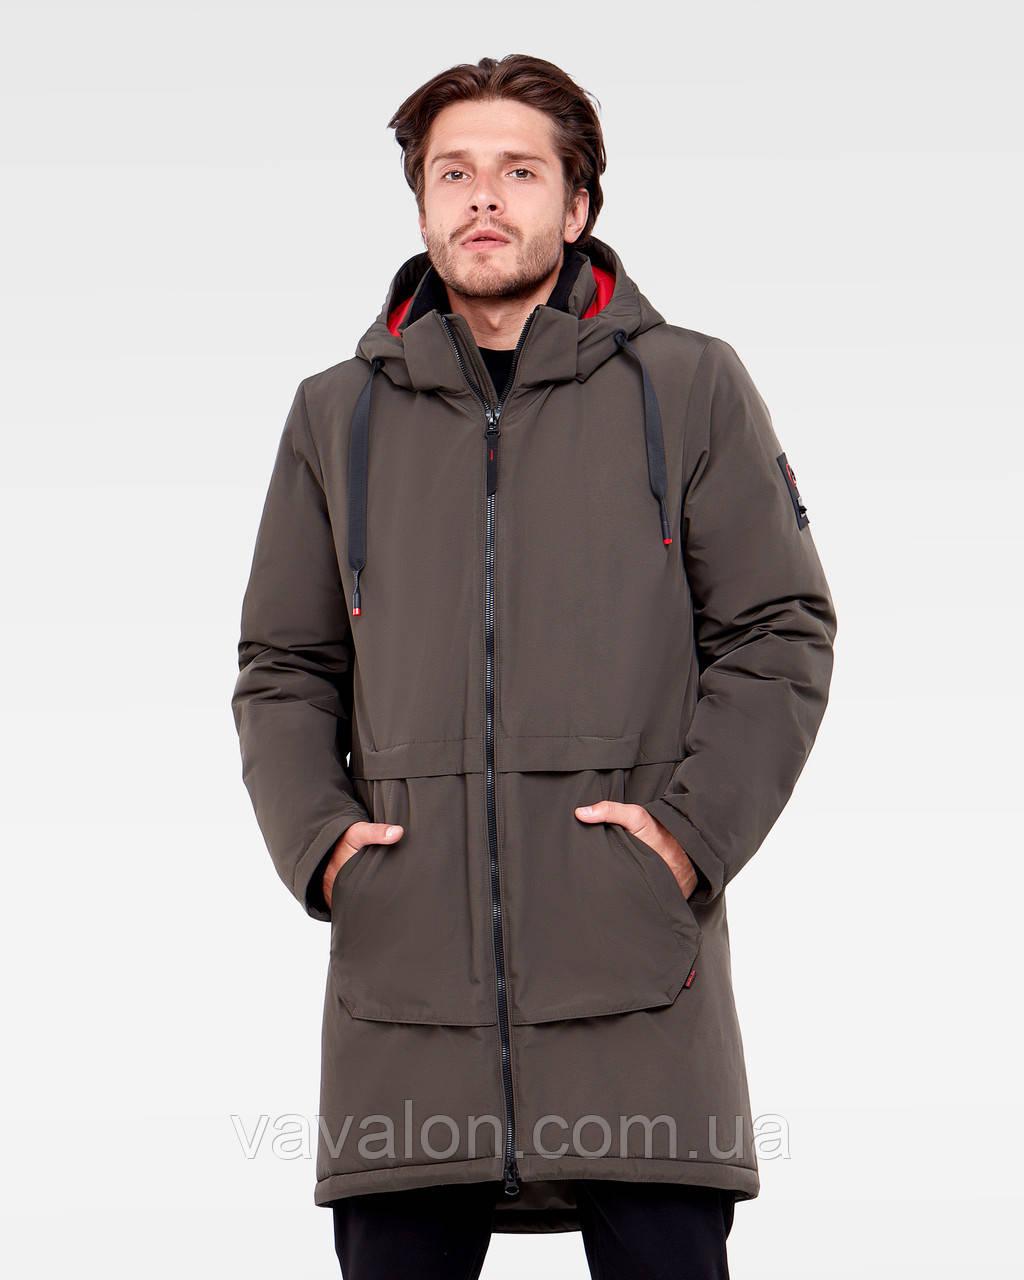 Зимняя мужская куртка Vavalon KZ-P910 Khaki